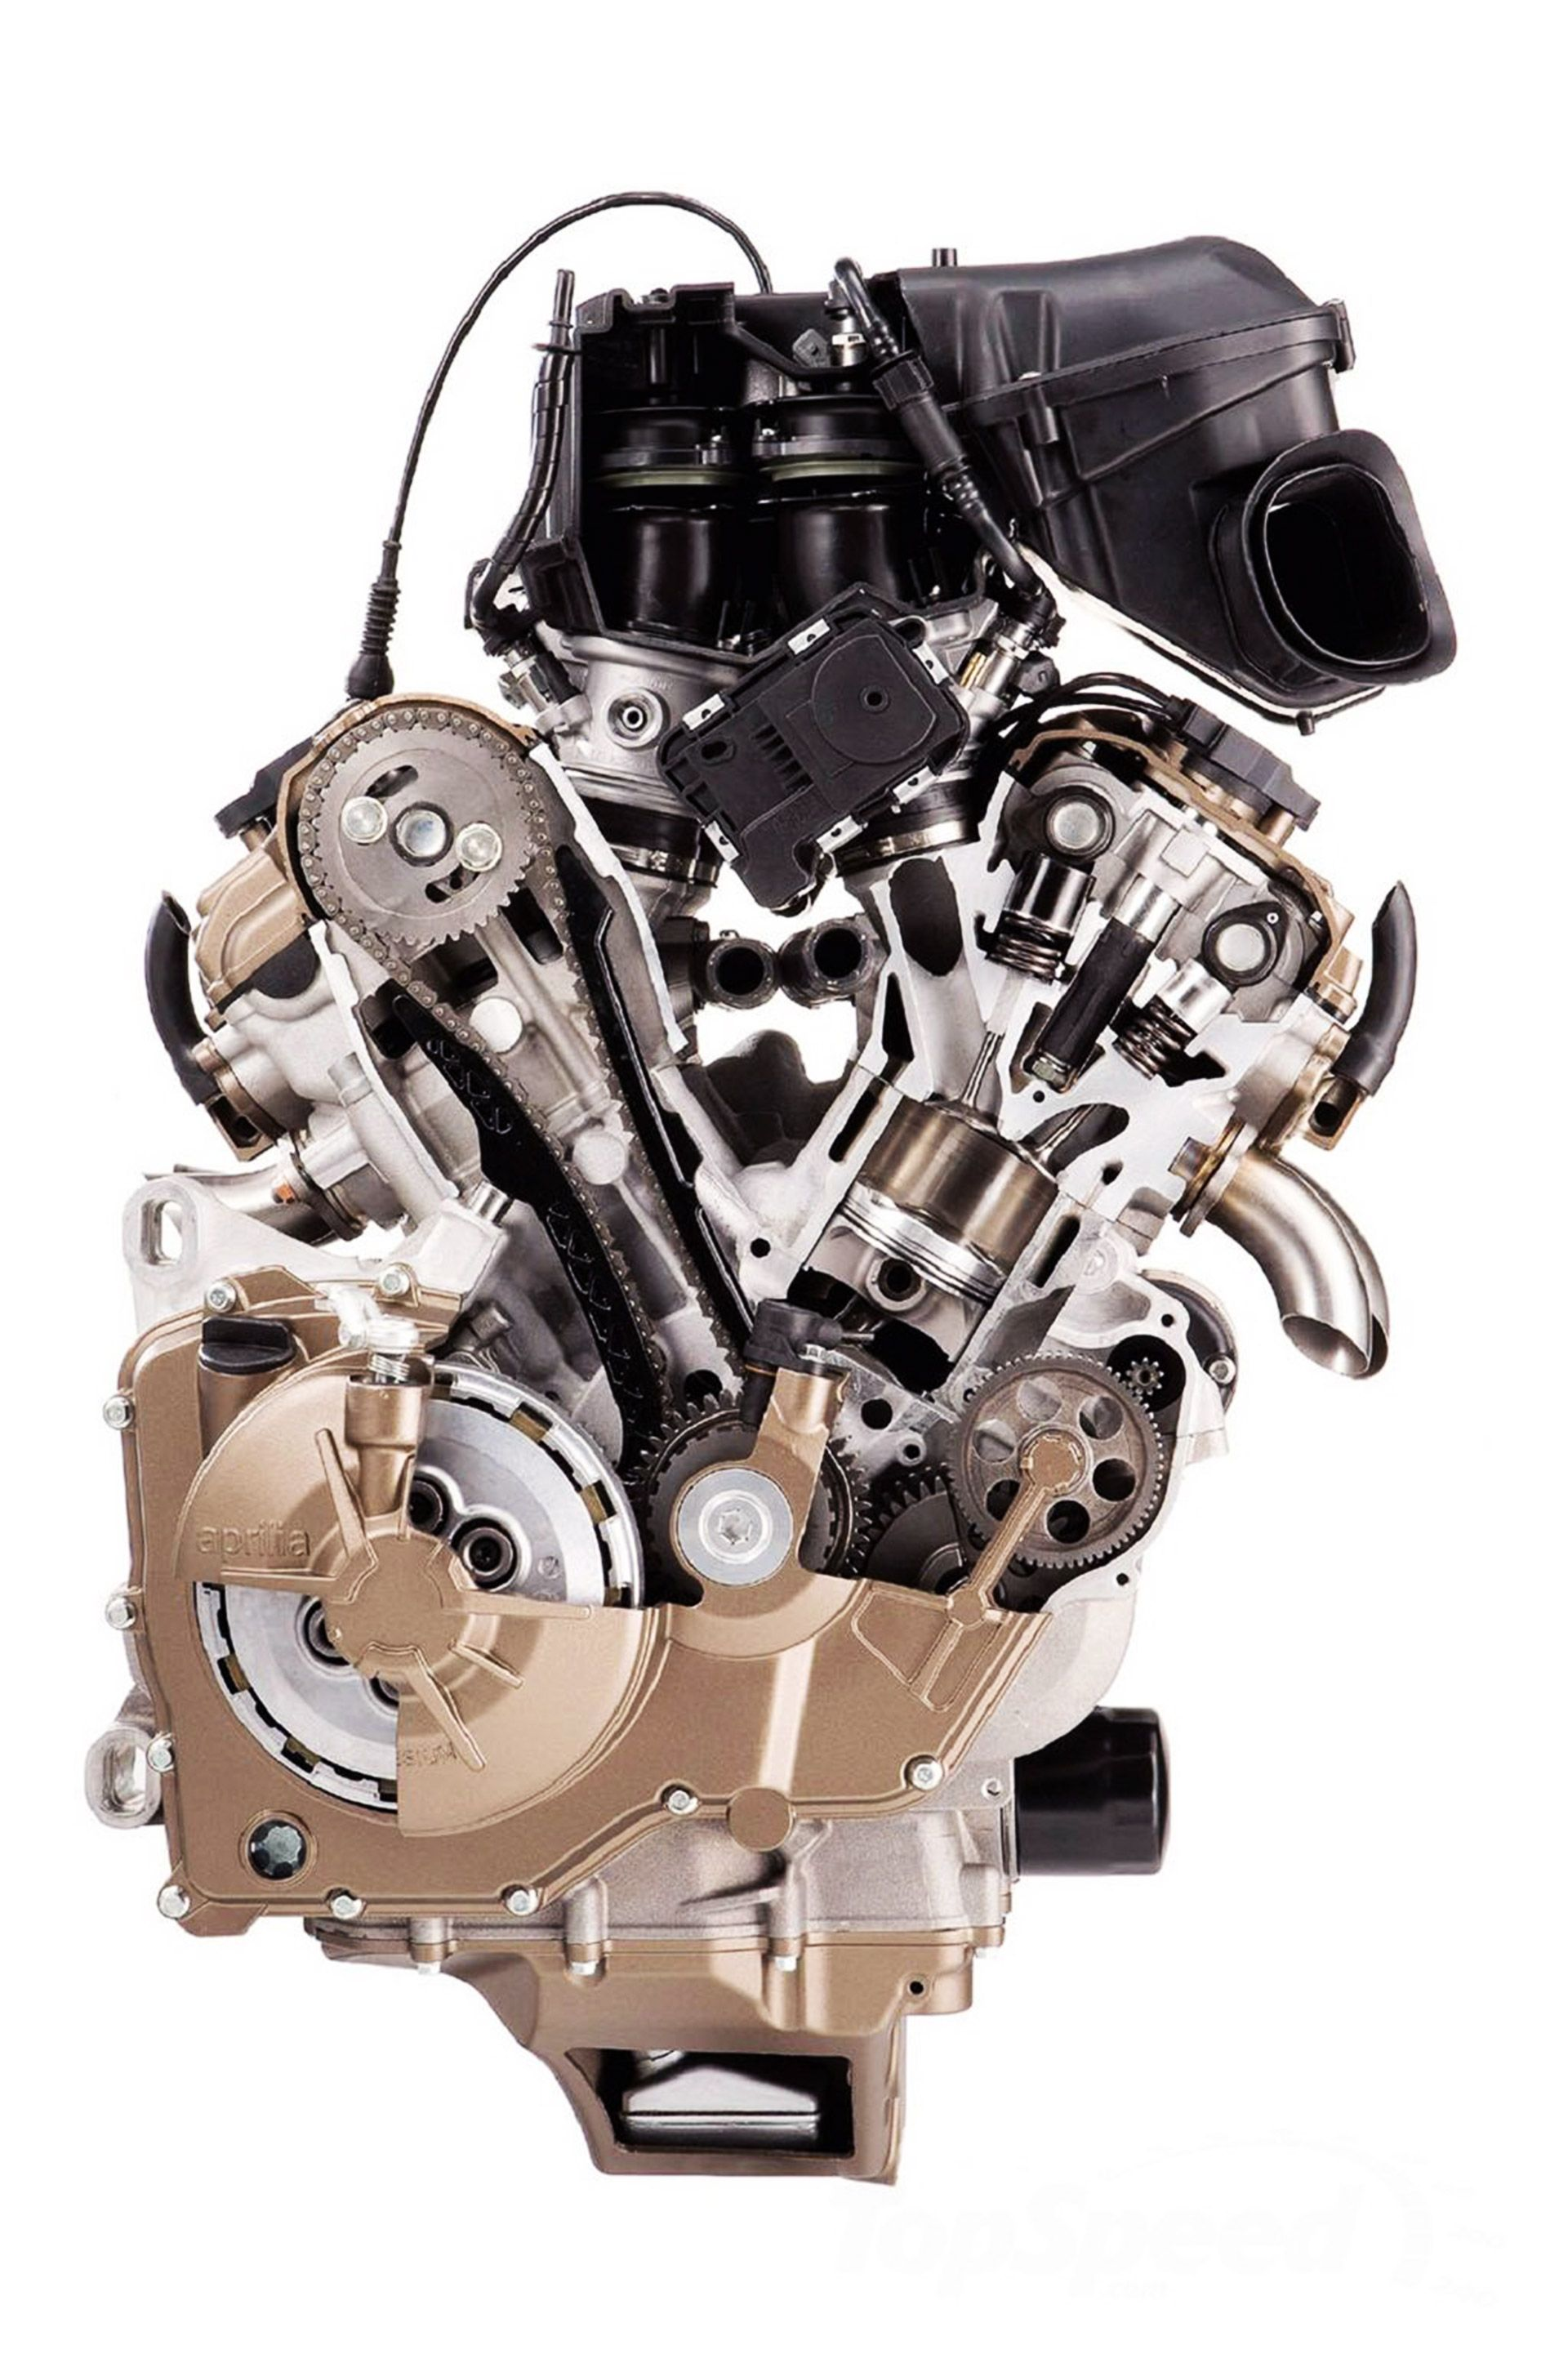 hight resolution of aprilia engine schematics wiring diagrams aprilia motorcycles aprilia engine schematics